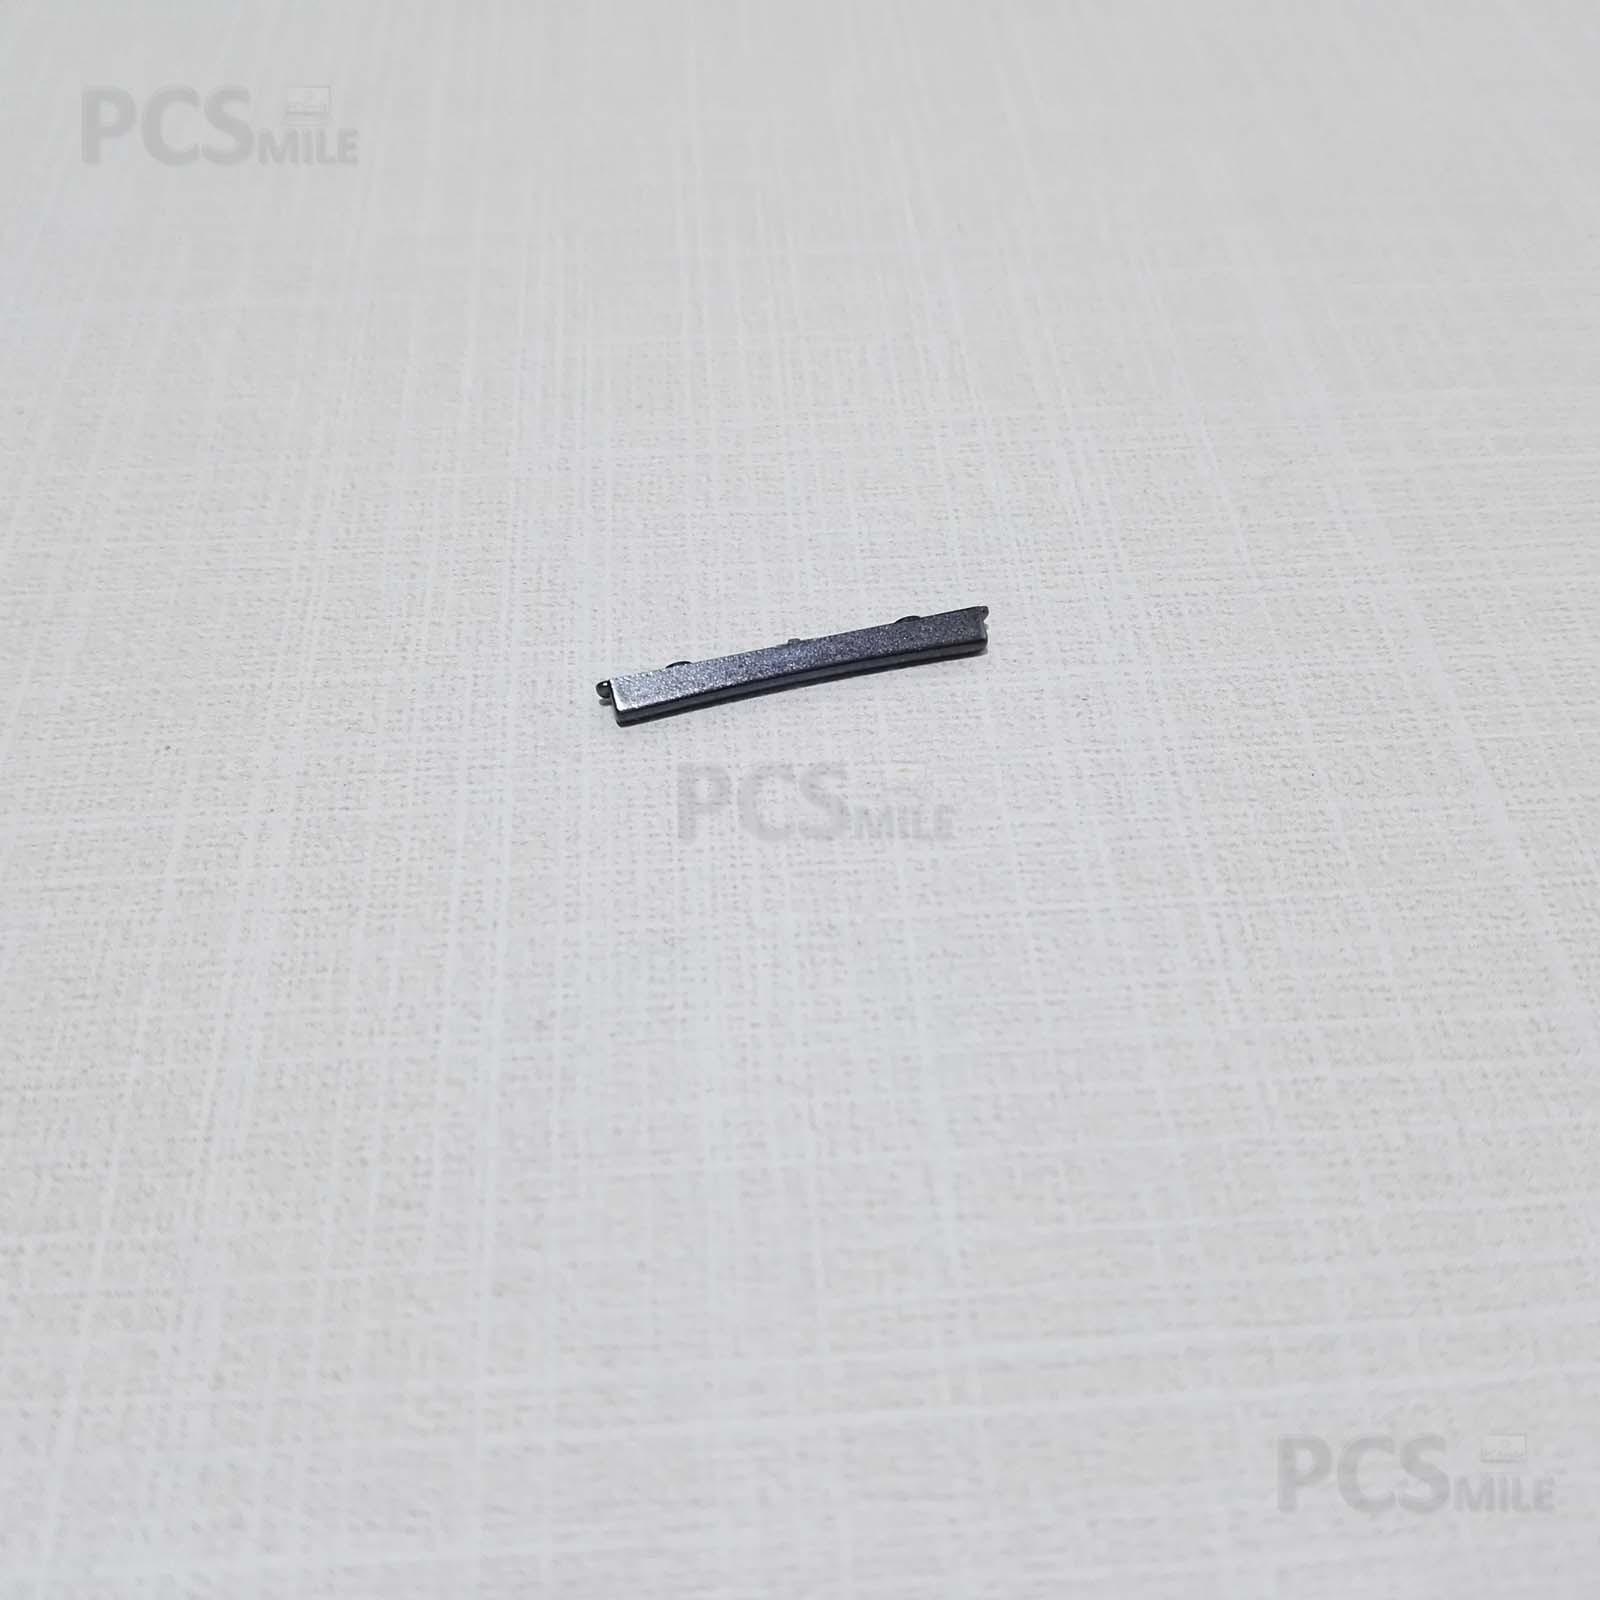 Tasti volume laterali Archos 55 Platinum AC55PL pulsante vol + - blu